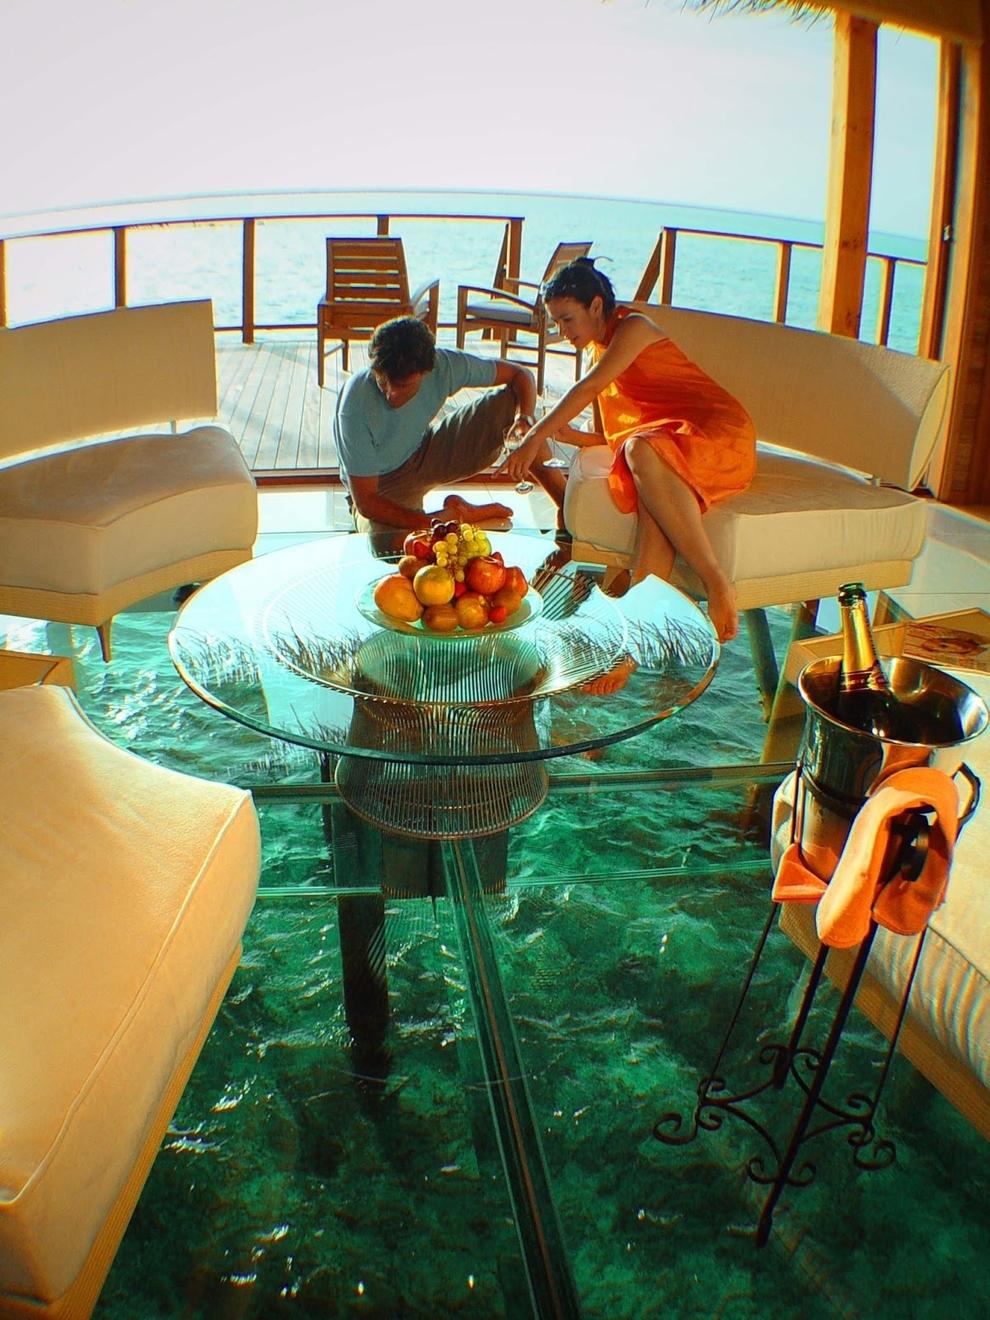 chão de vidro - quarto hotel Bora Bora